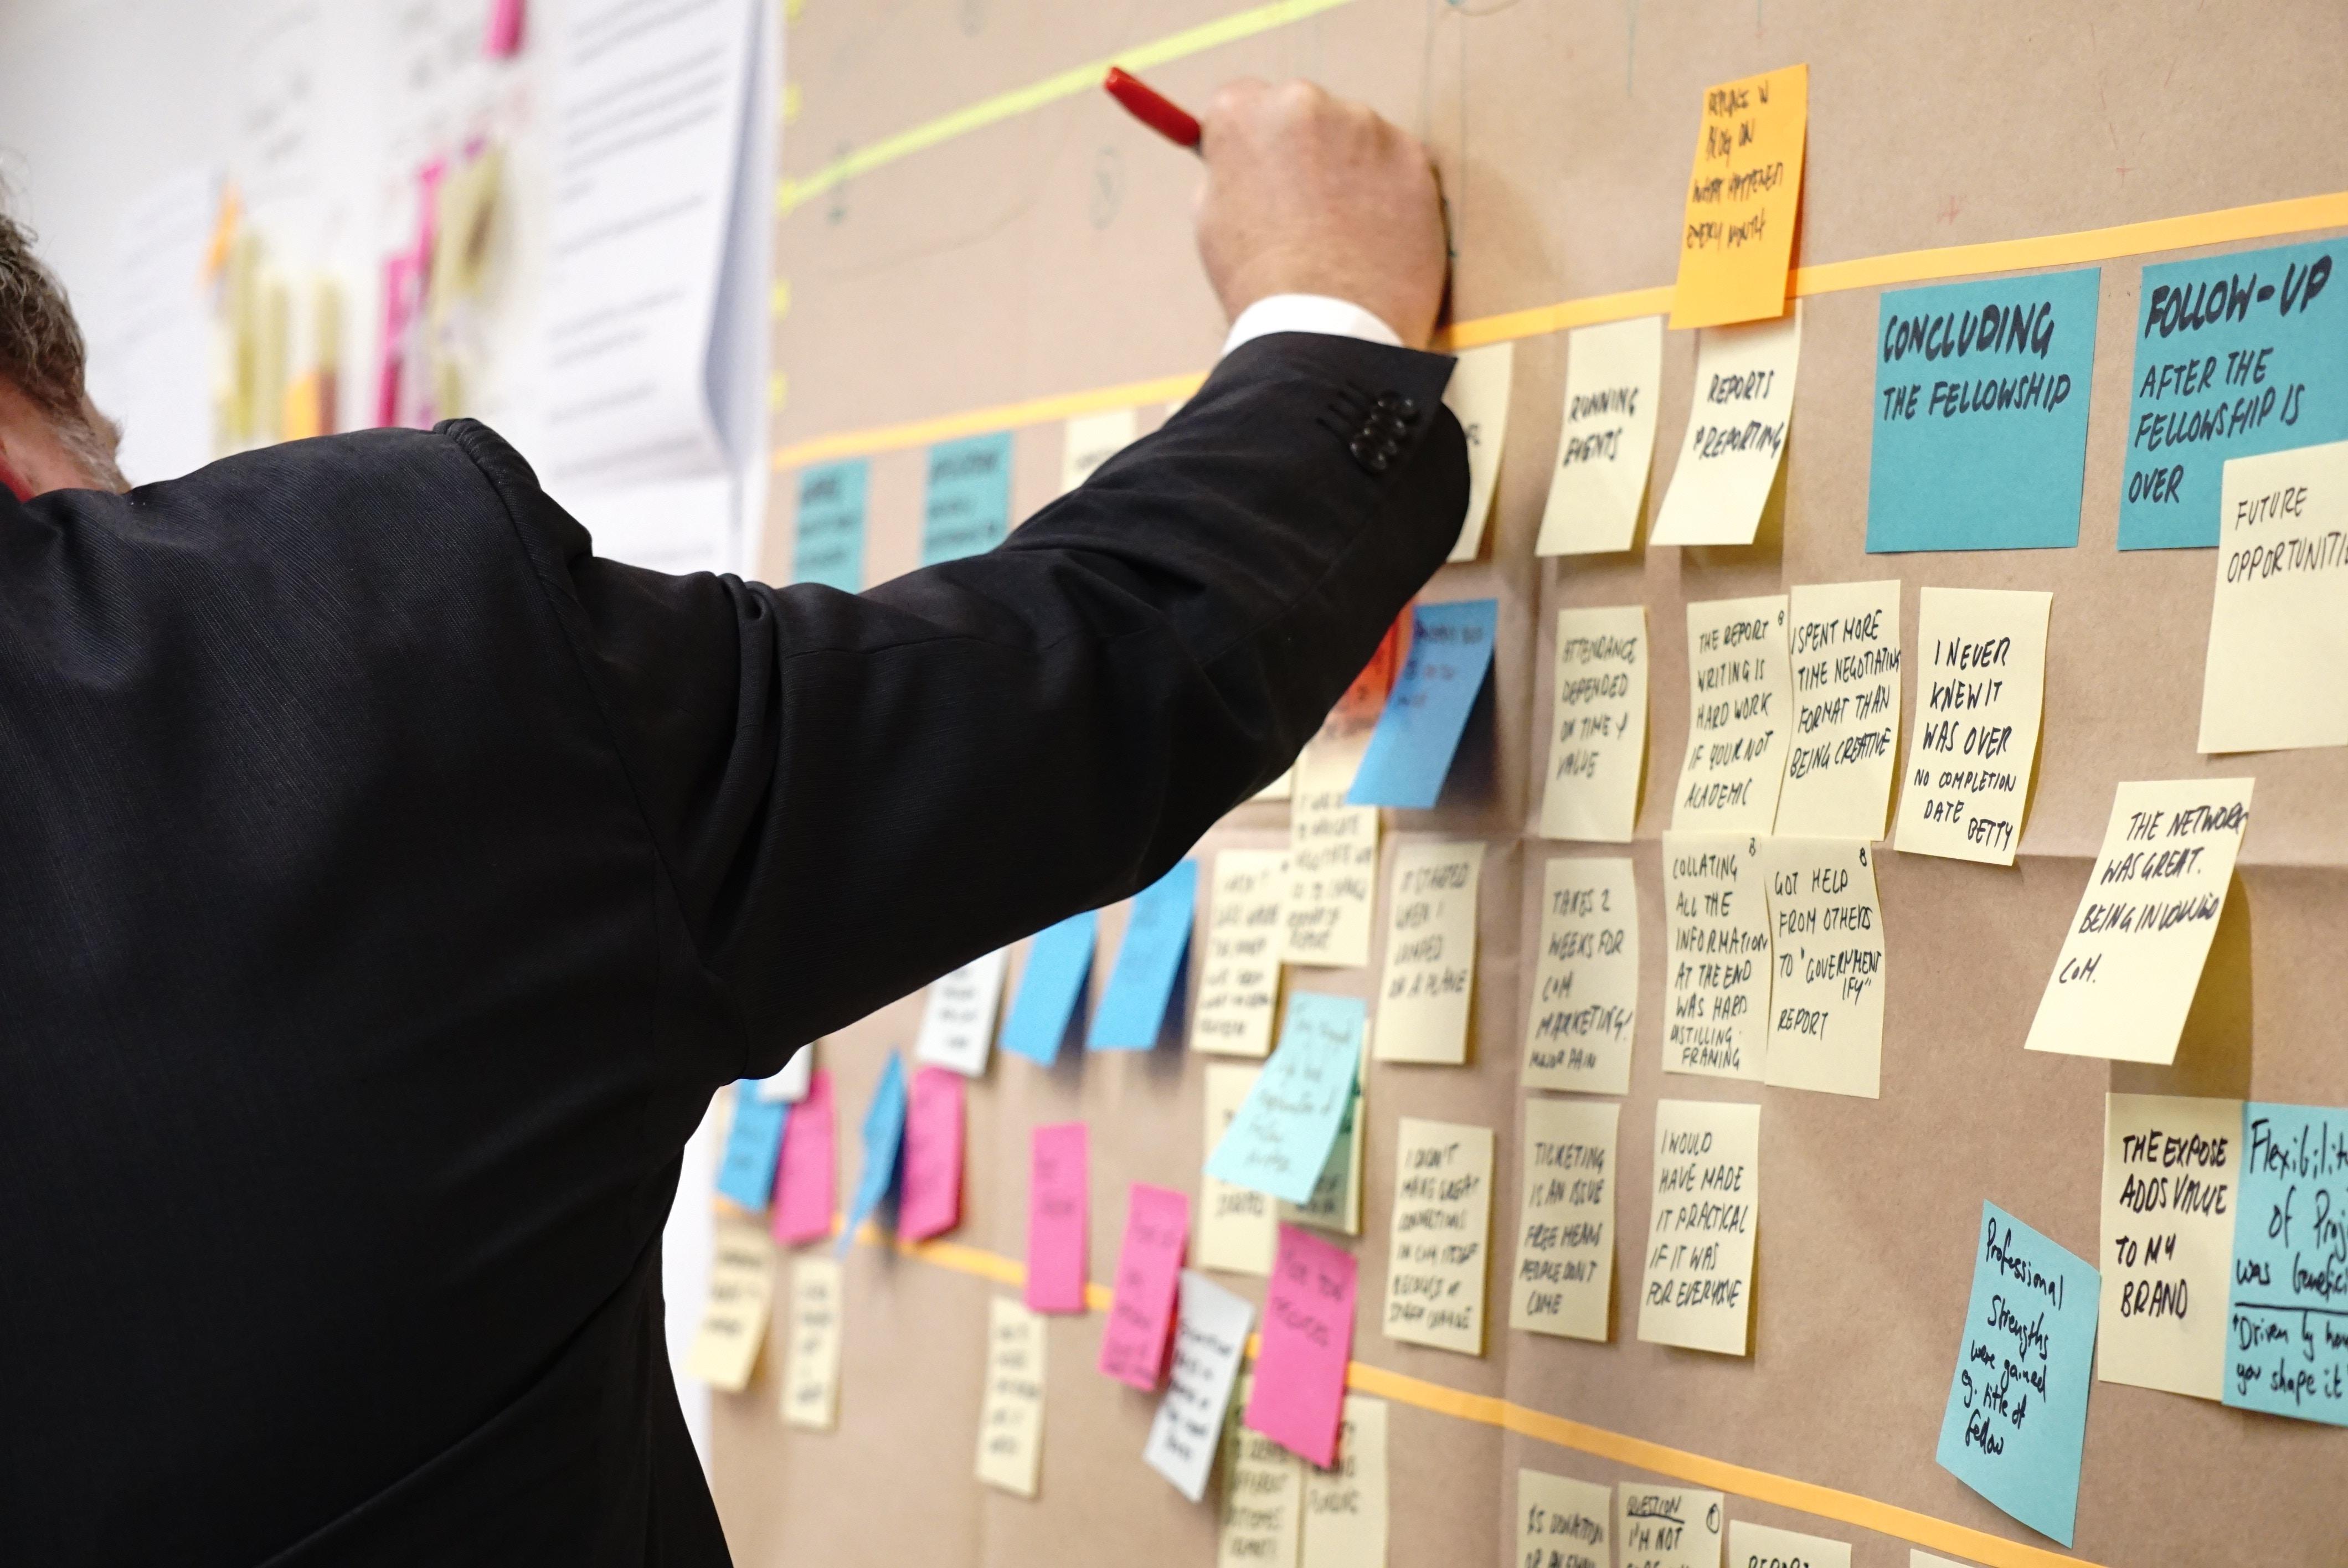 Développer votre organisation